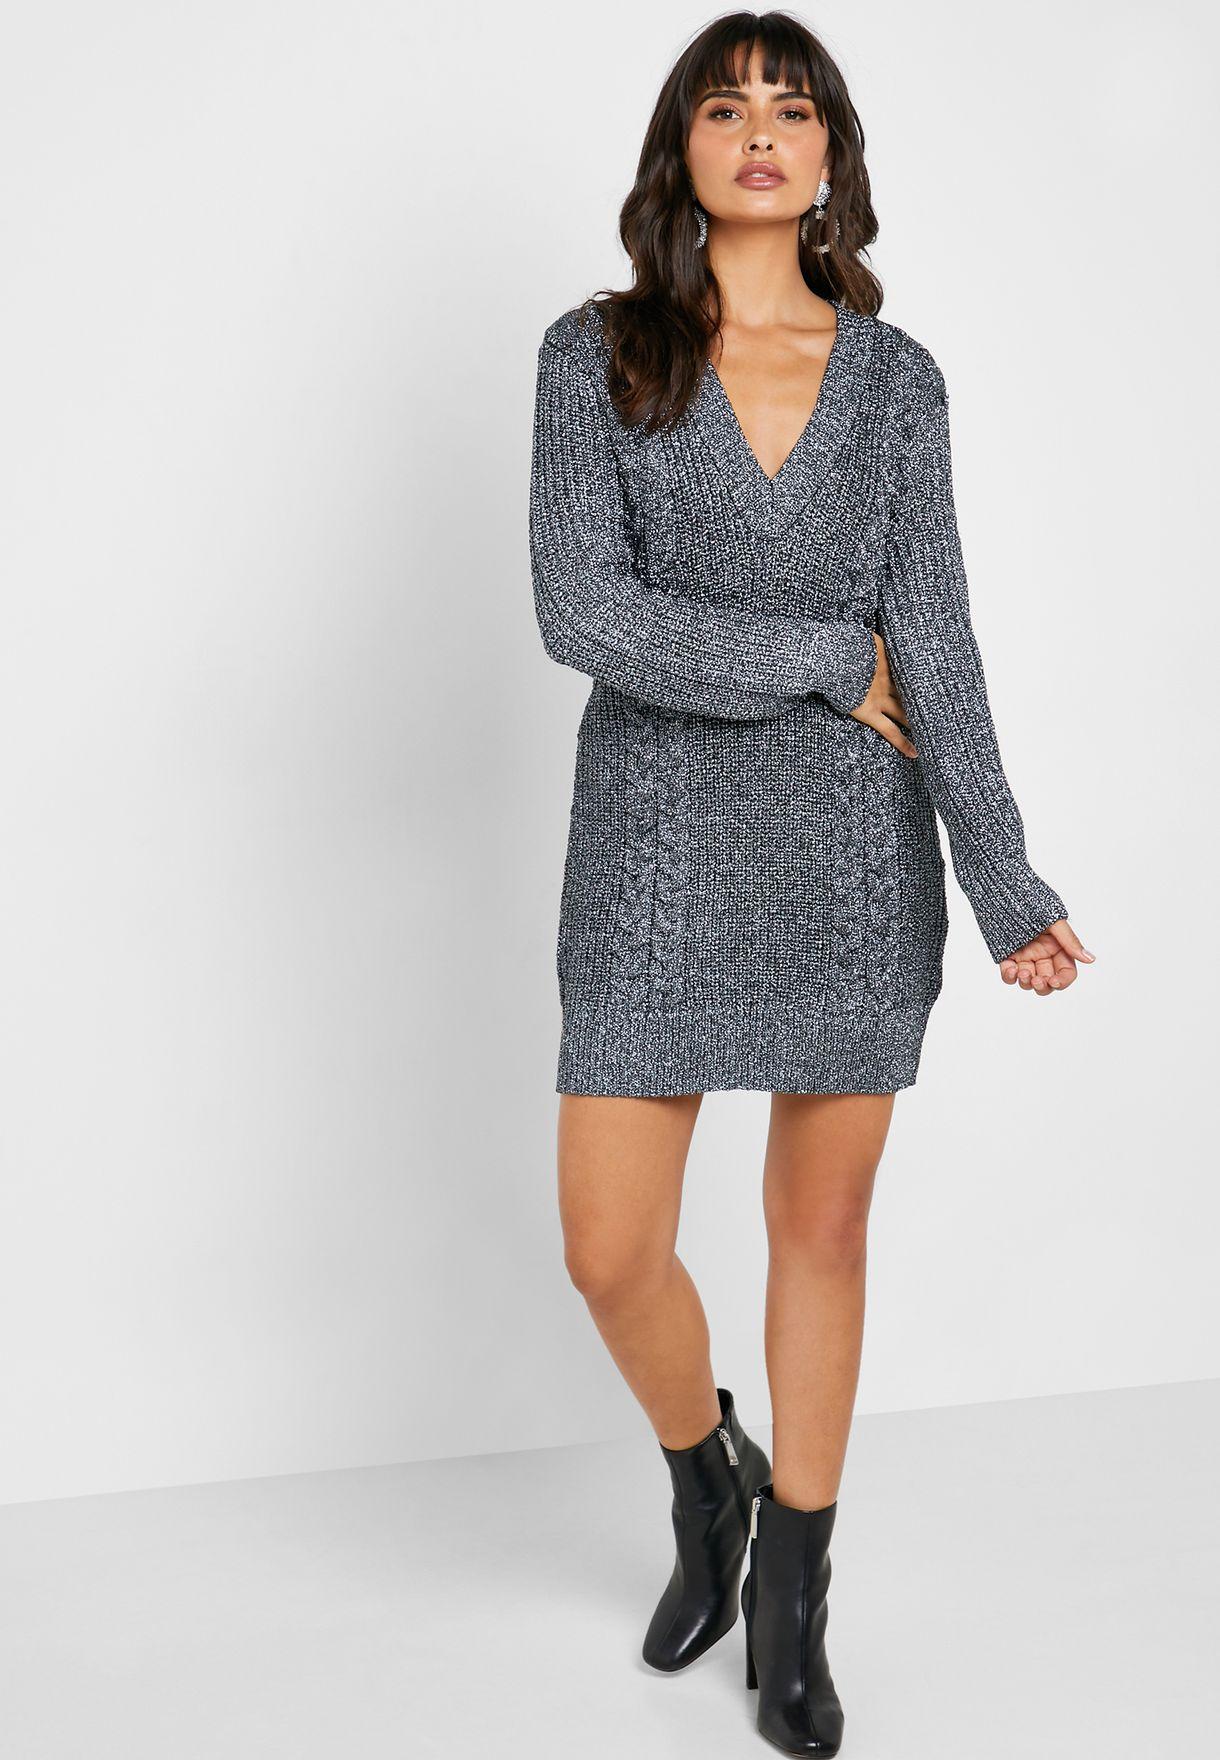 V-Neck Cable Knit Sweater Dress